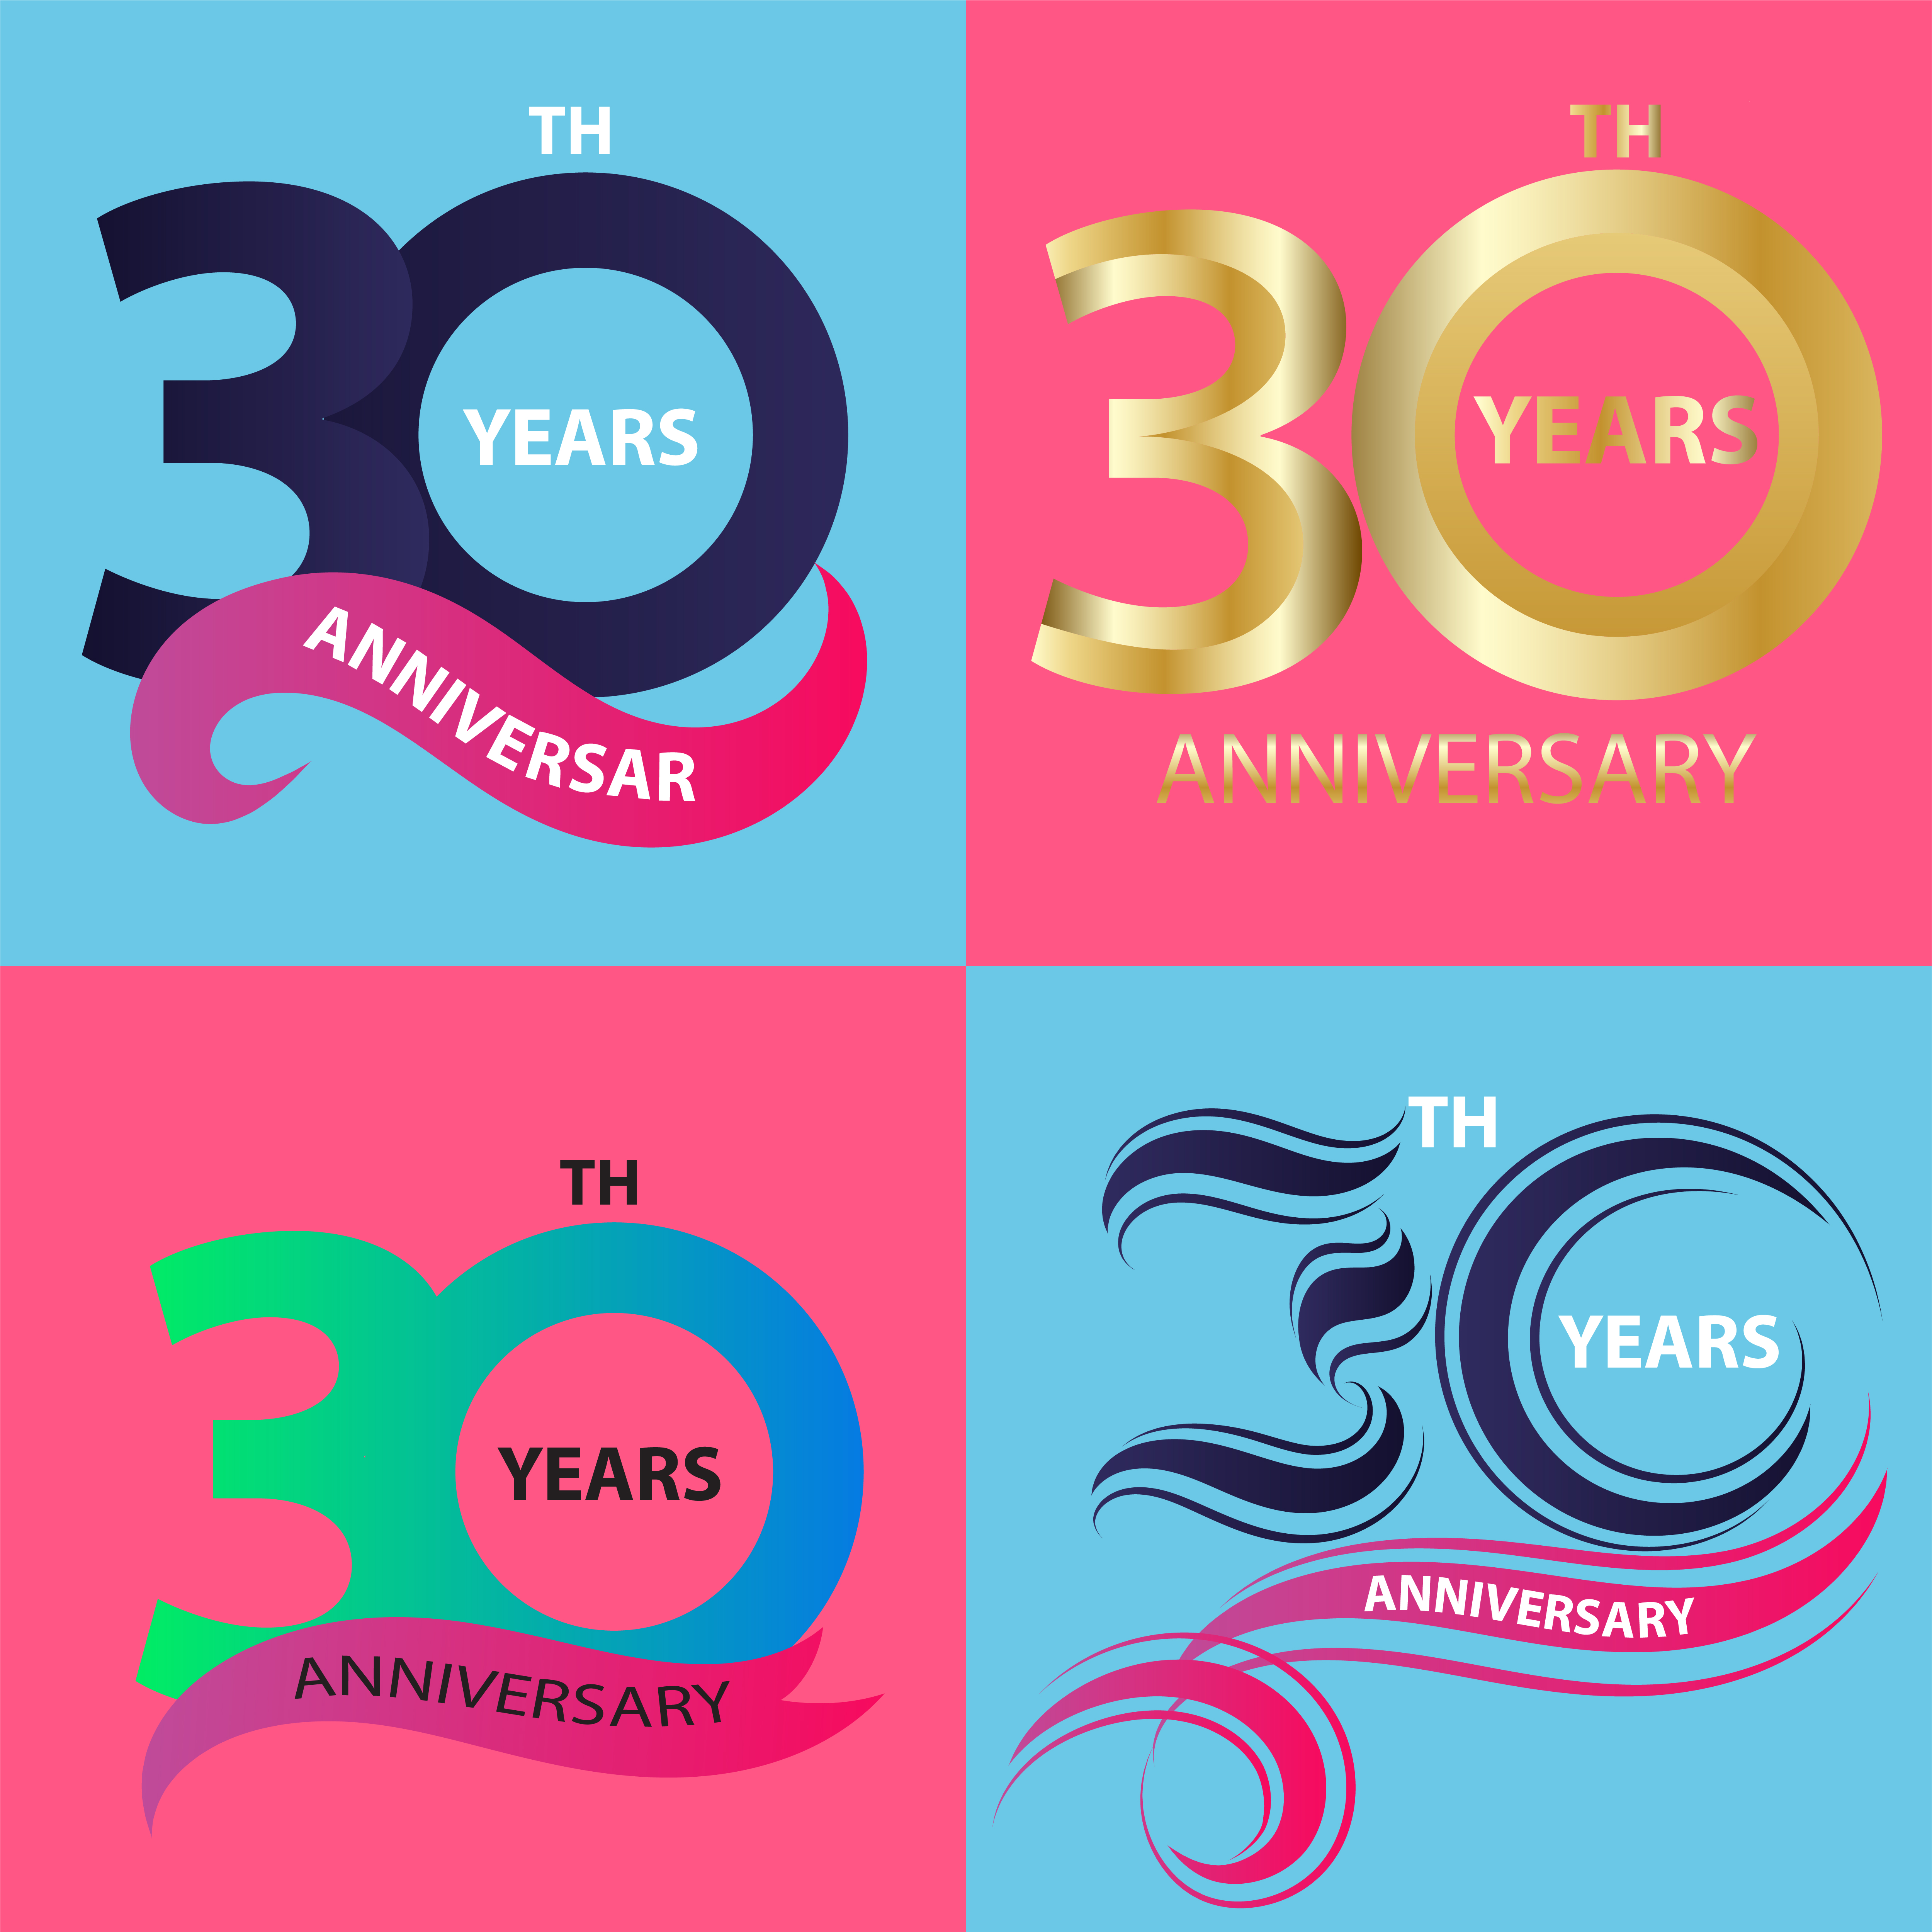 30 Year Anniversary Symbol: Set 30th Anniversary Sign And Logo Celebration Symbol